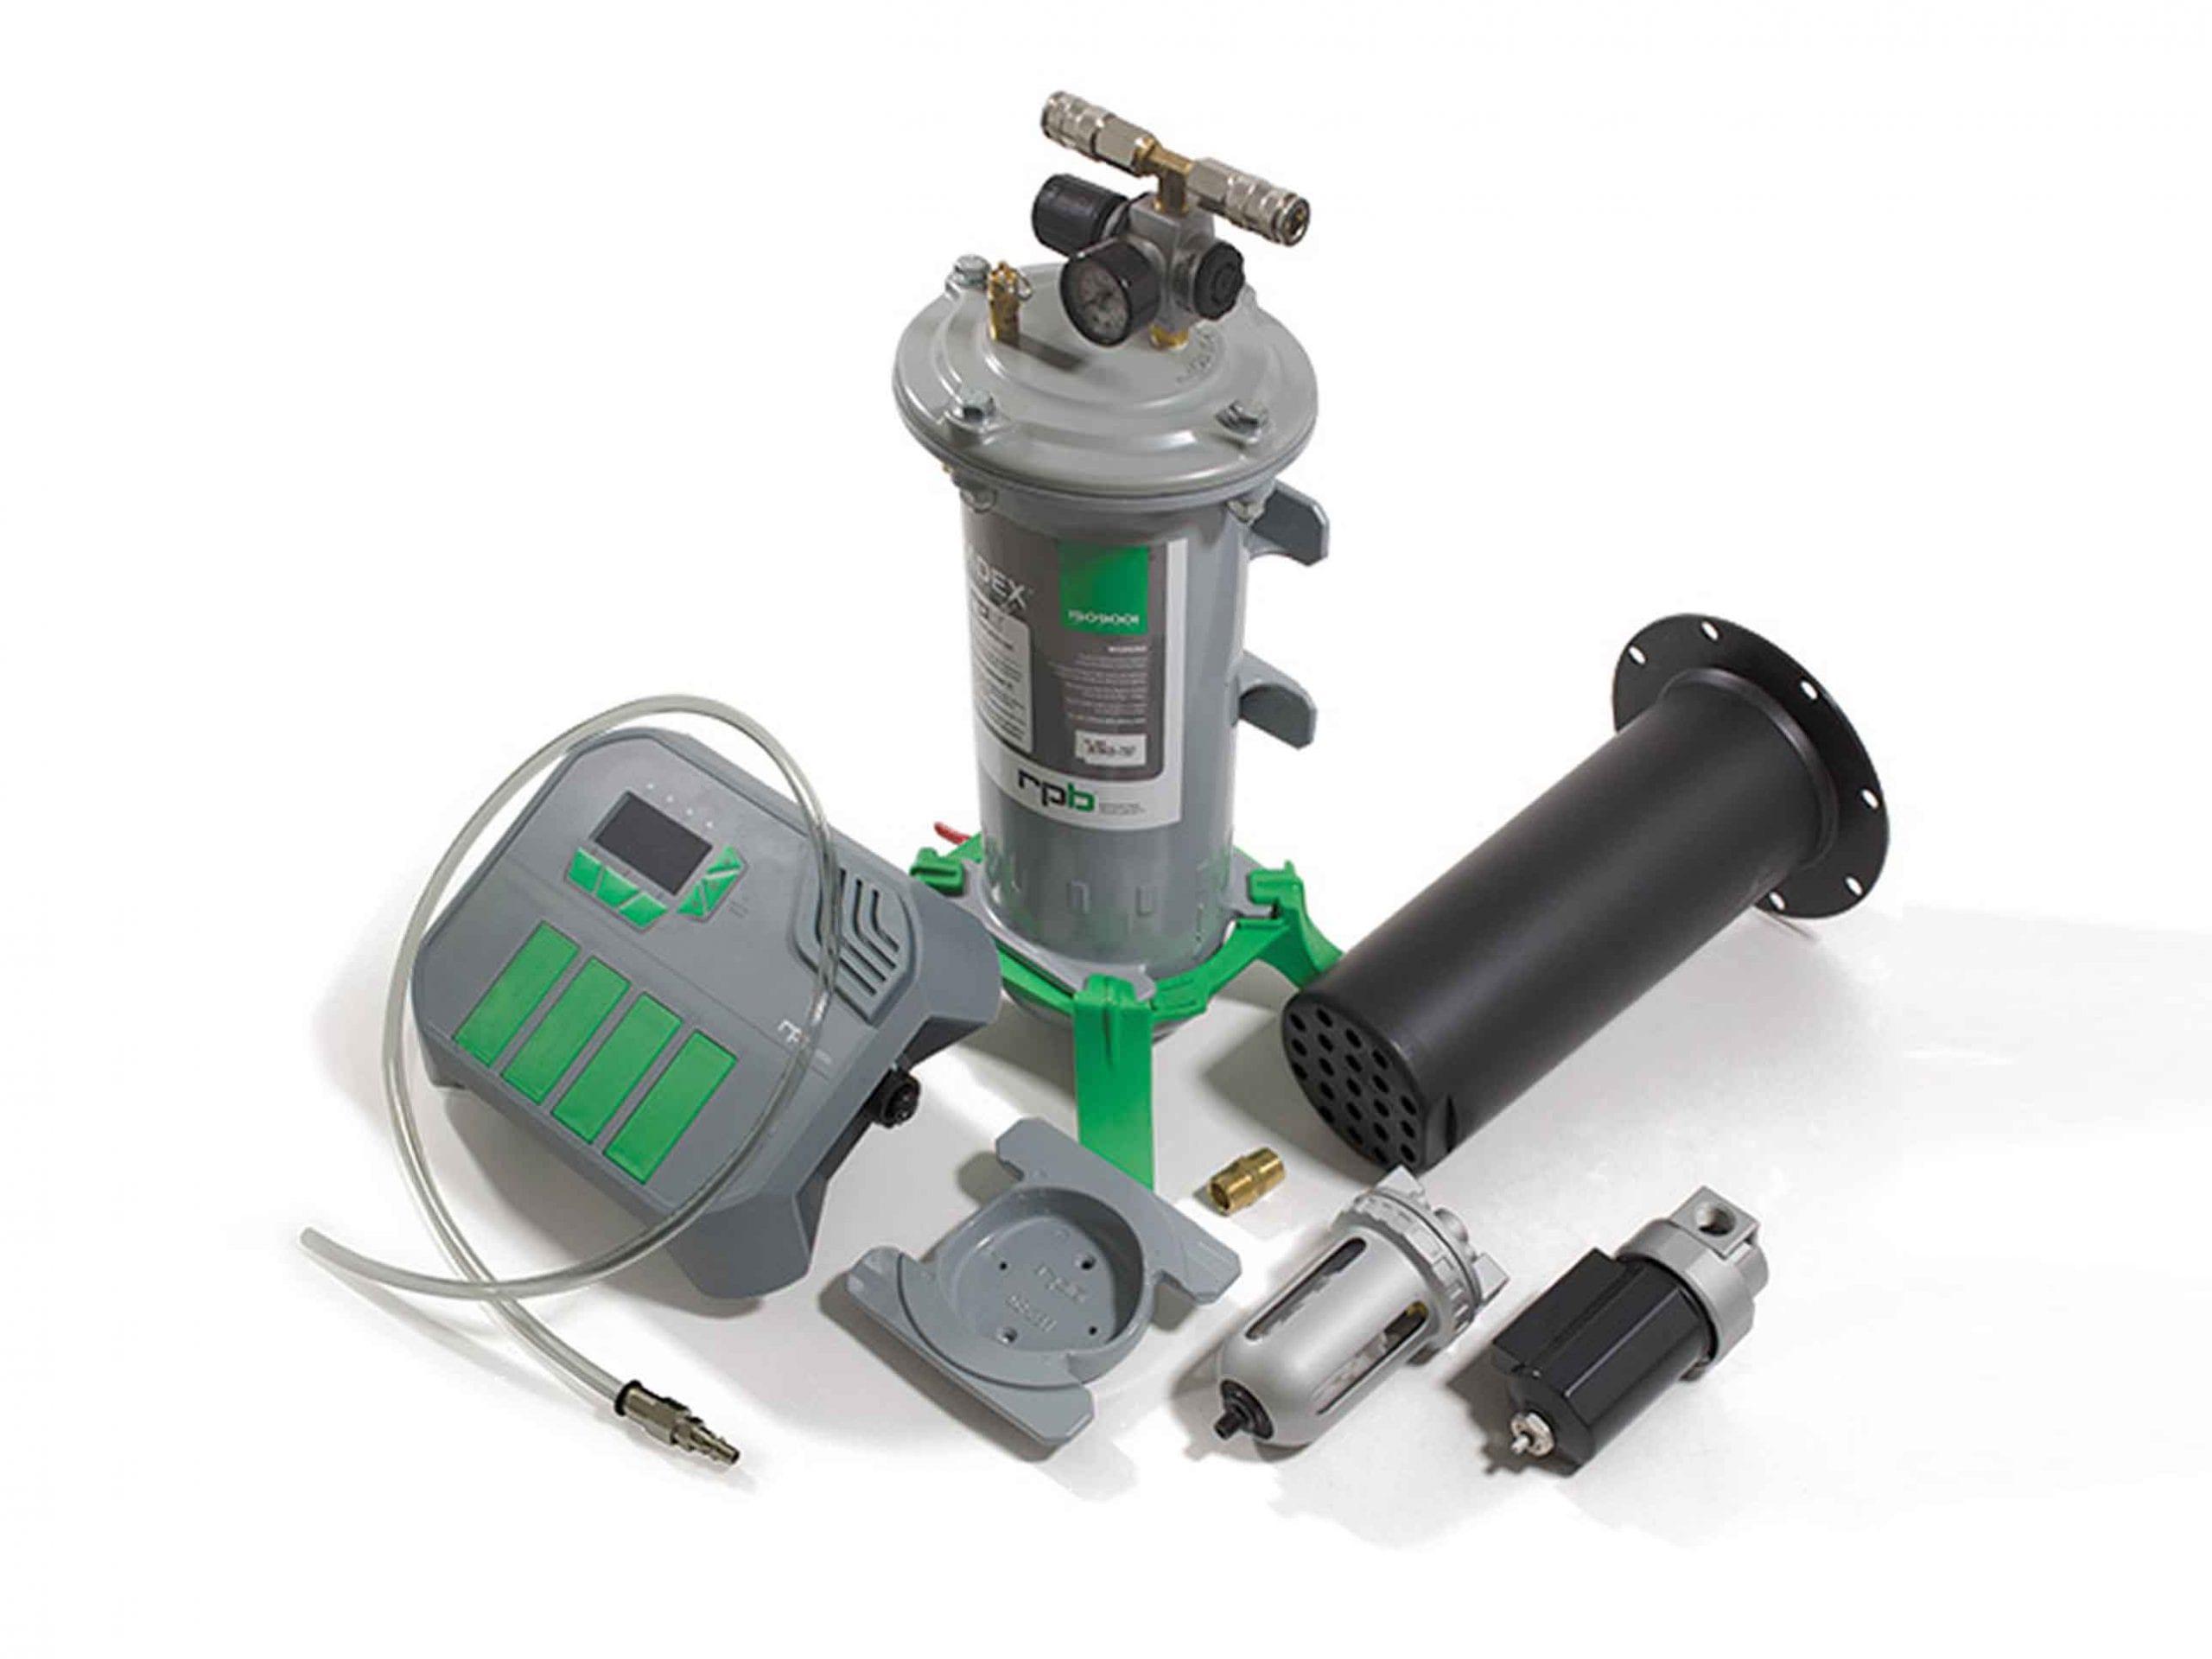 RPB Air Monitoring, Filtration, and Supply systems